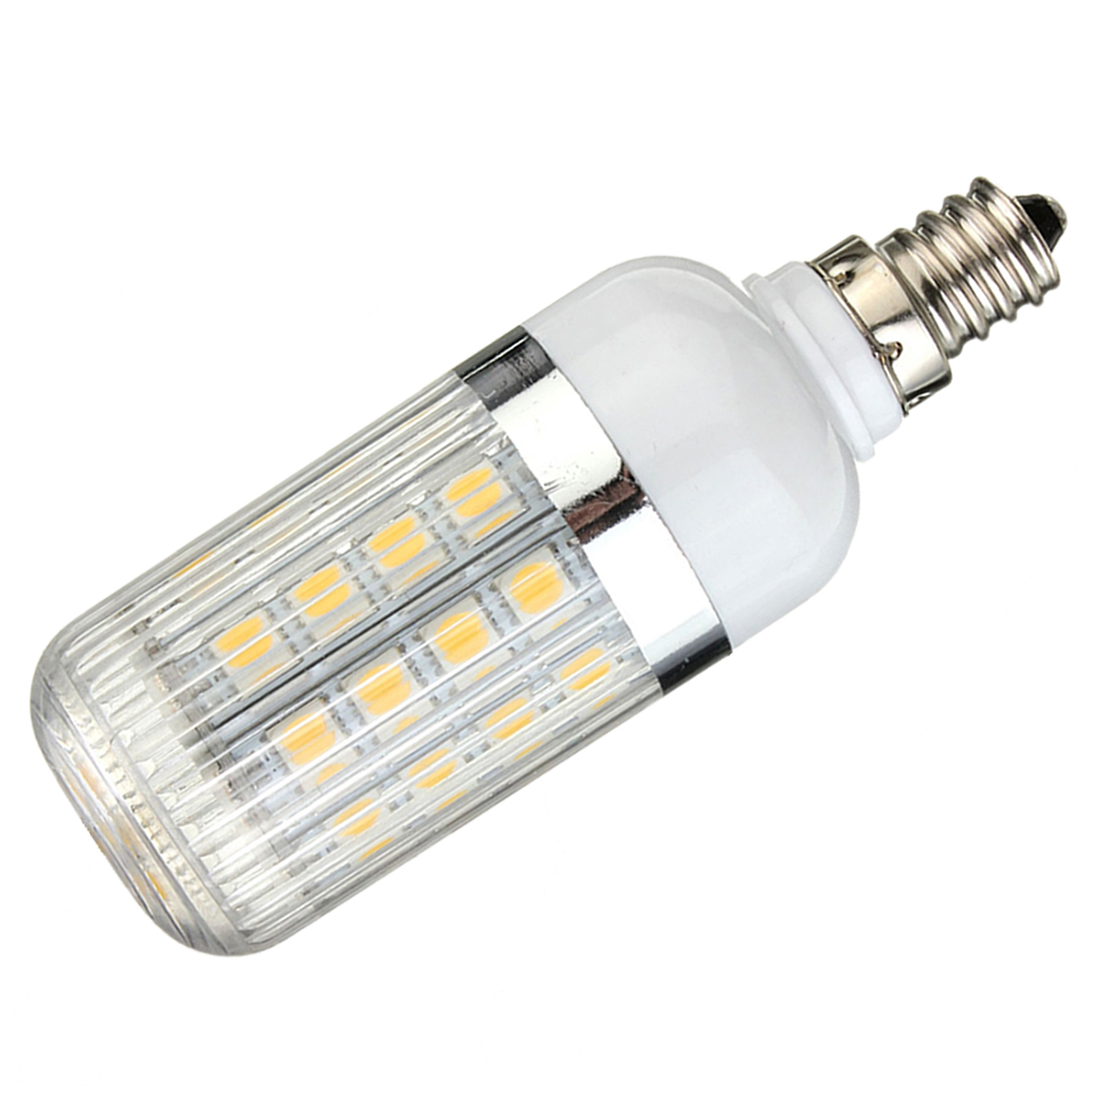 E12 5W Dimmable 36 SMD 5050 LED Corn Light Bulb Lamp Color Temperature:Warm White(3000-3500K) Amount:8 Pcs new corn bulb e27 9 11 12 14w 220v pure warm white smd 5050 44 52 60 64 led spot light bulb lamp flat tube